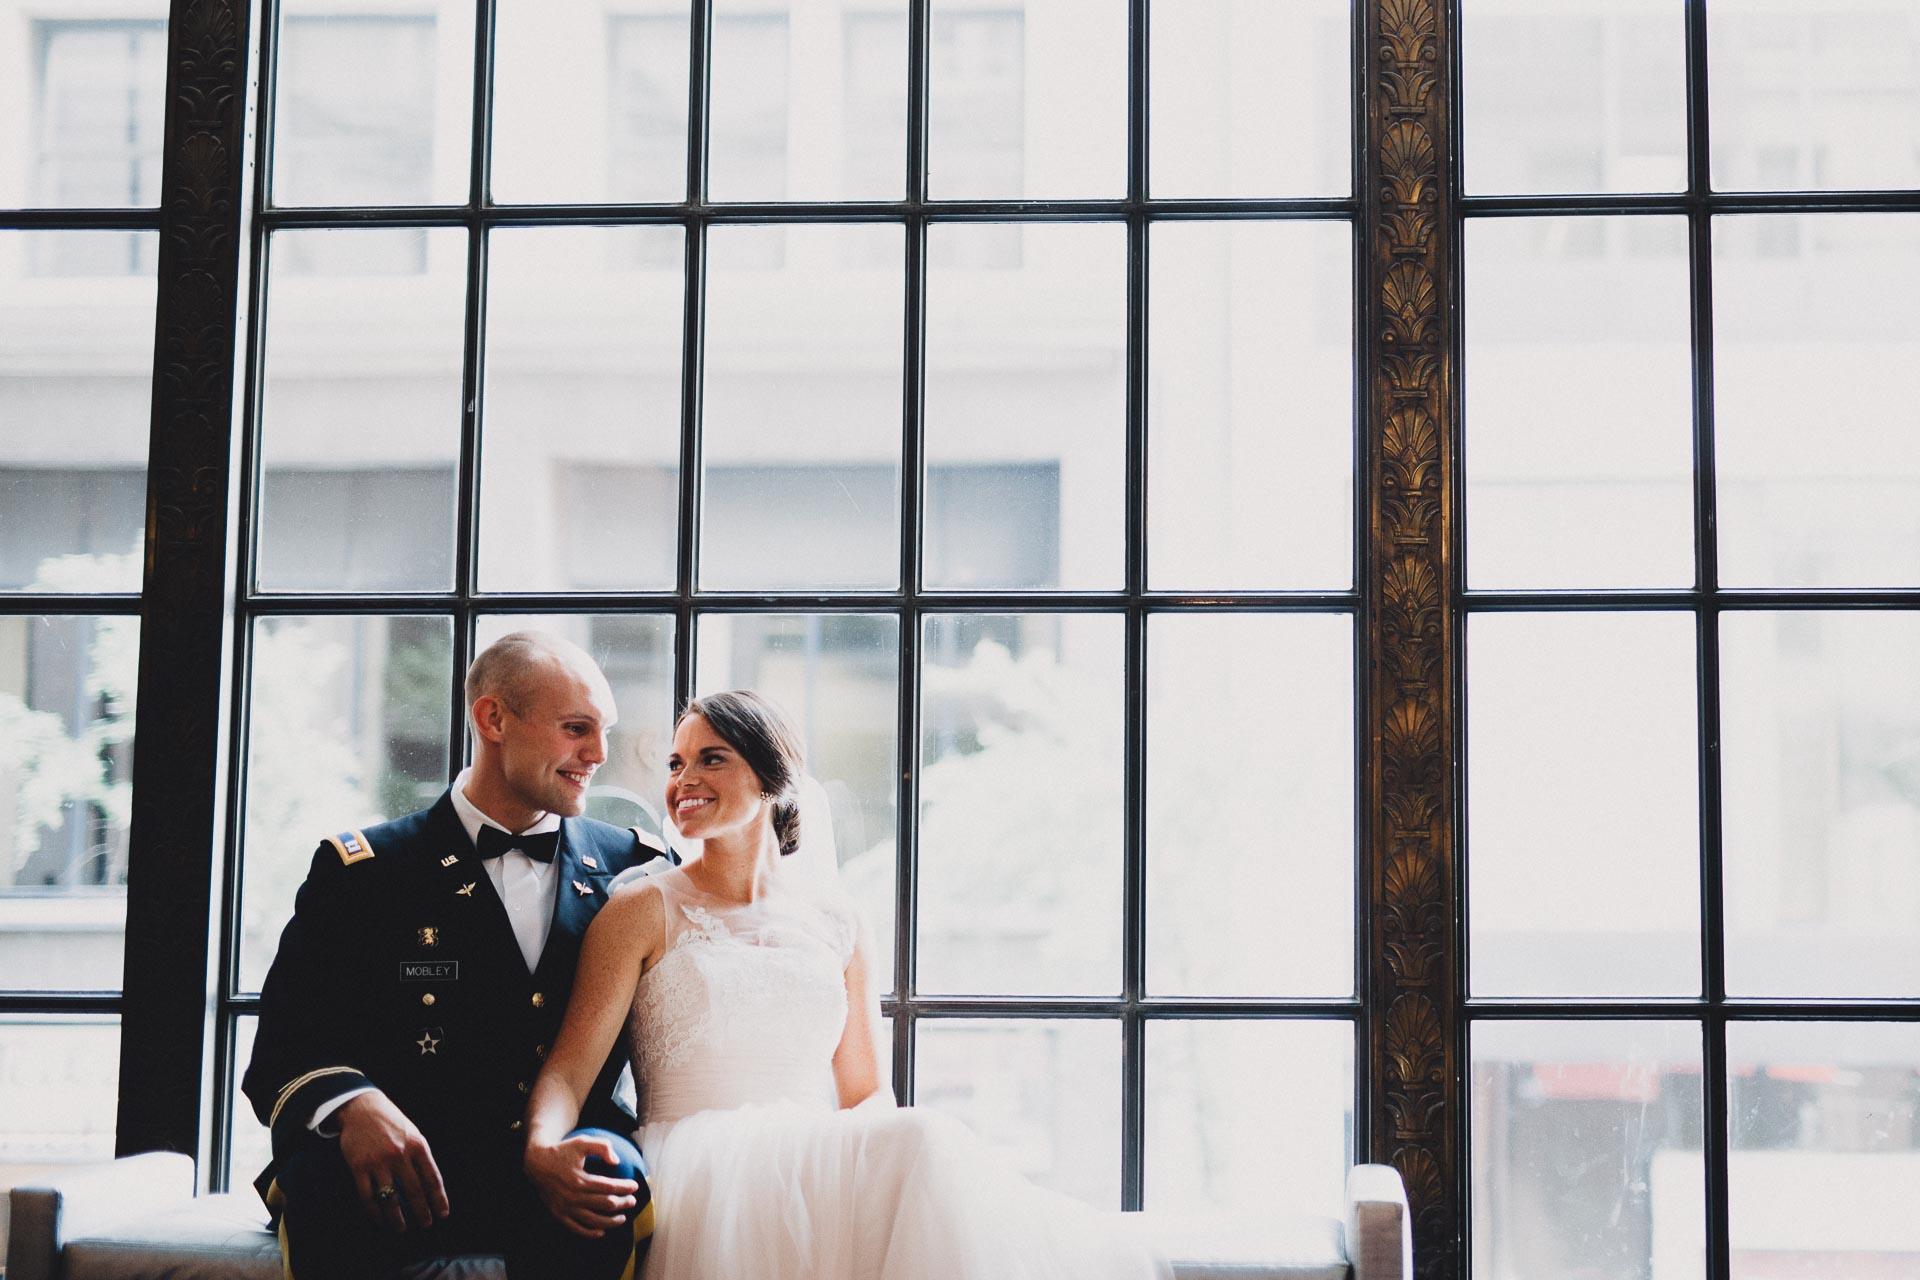 Emily-Eddie-Cincinnati-Rennaissance-Hotel-Wedding-076@2x.jpg